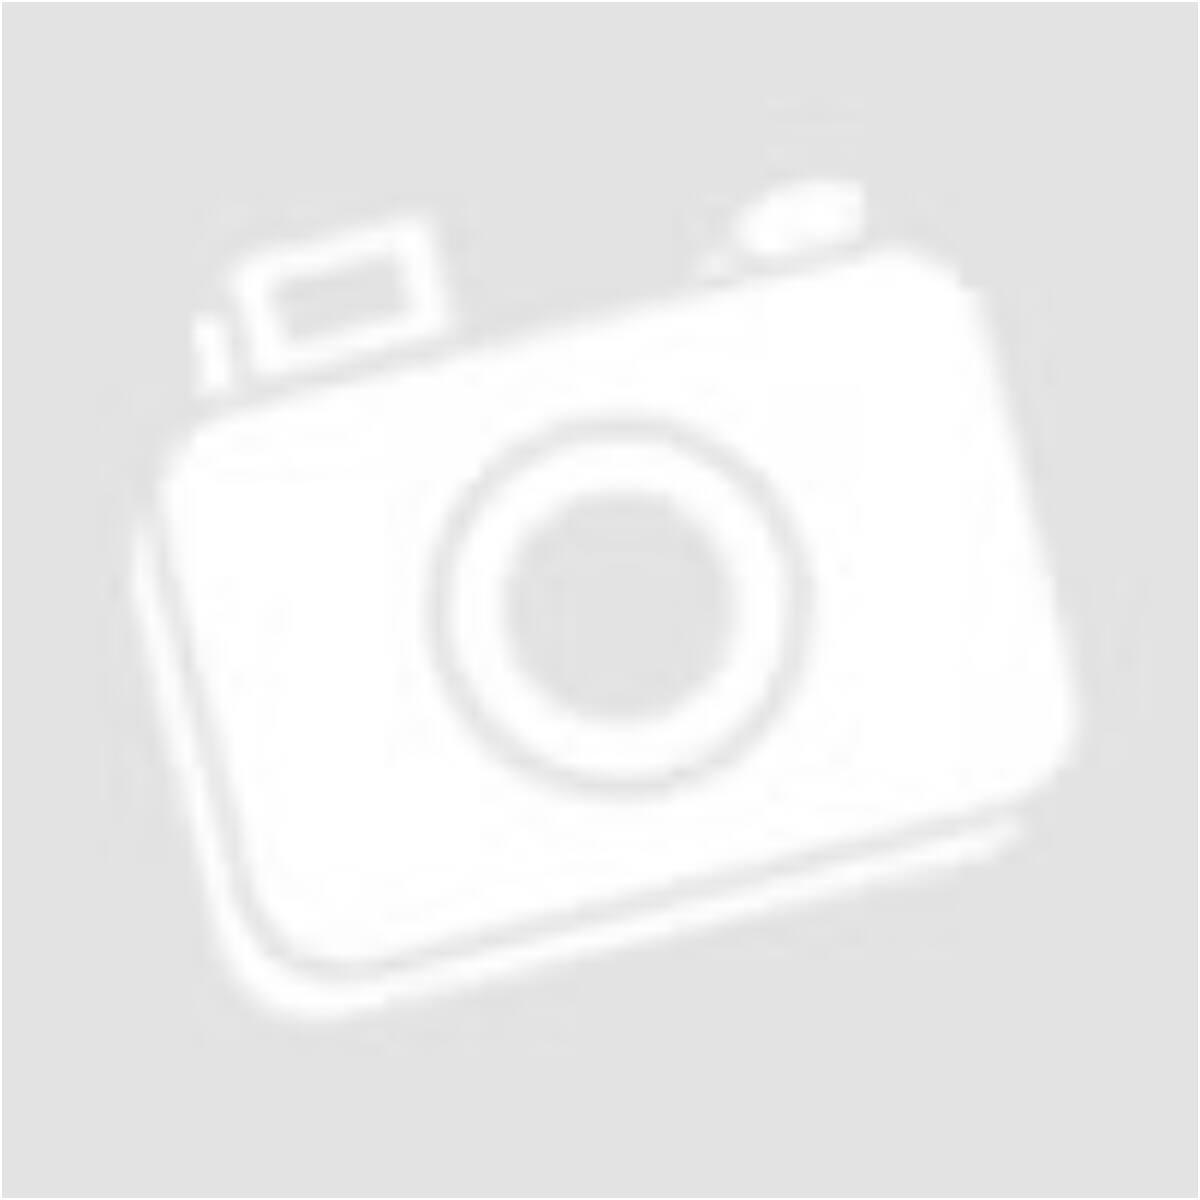 44e54a968d Gallér nélküli, rövid ujjú slim fit ing #5518 - kék - Rövid ujjú ingek